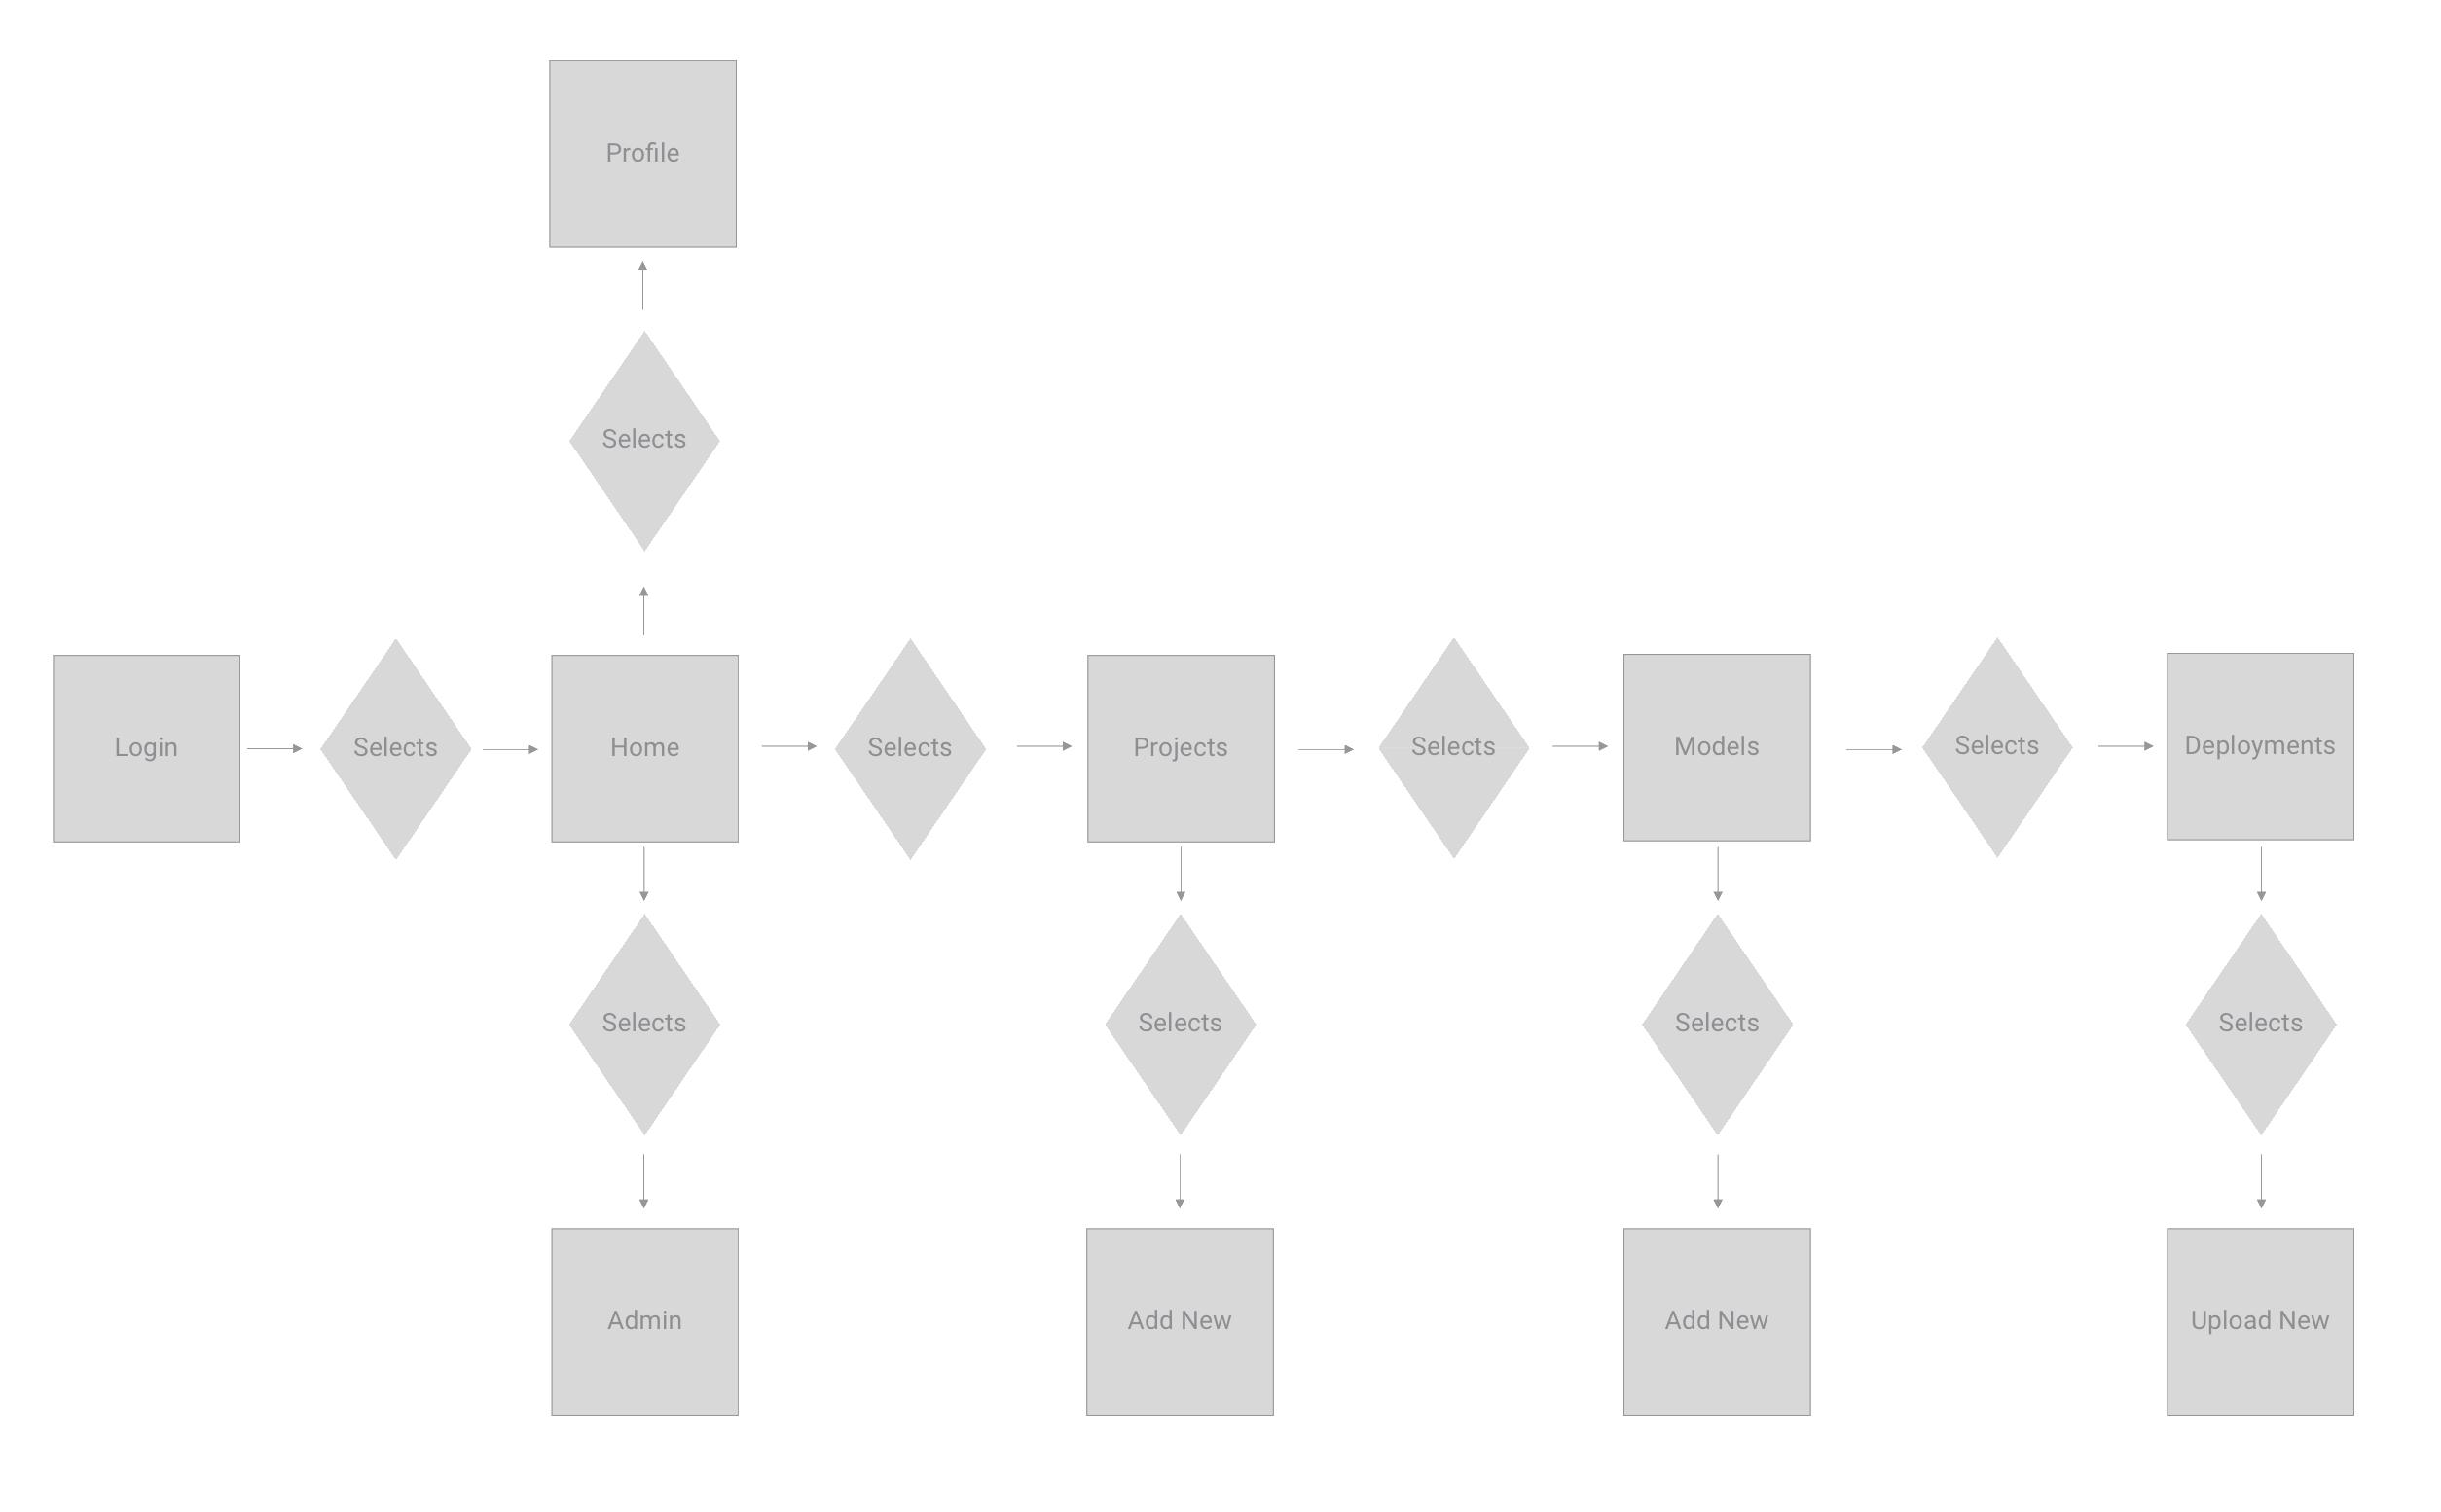 CLARC Home Userflow